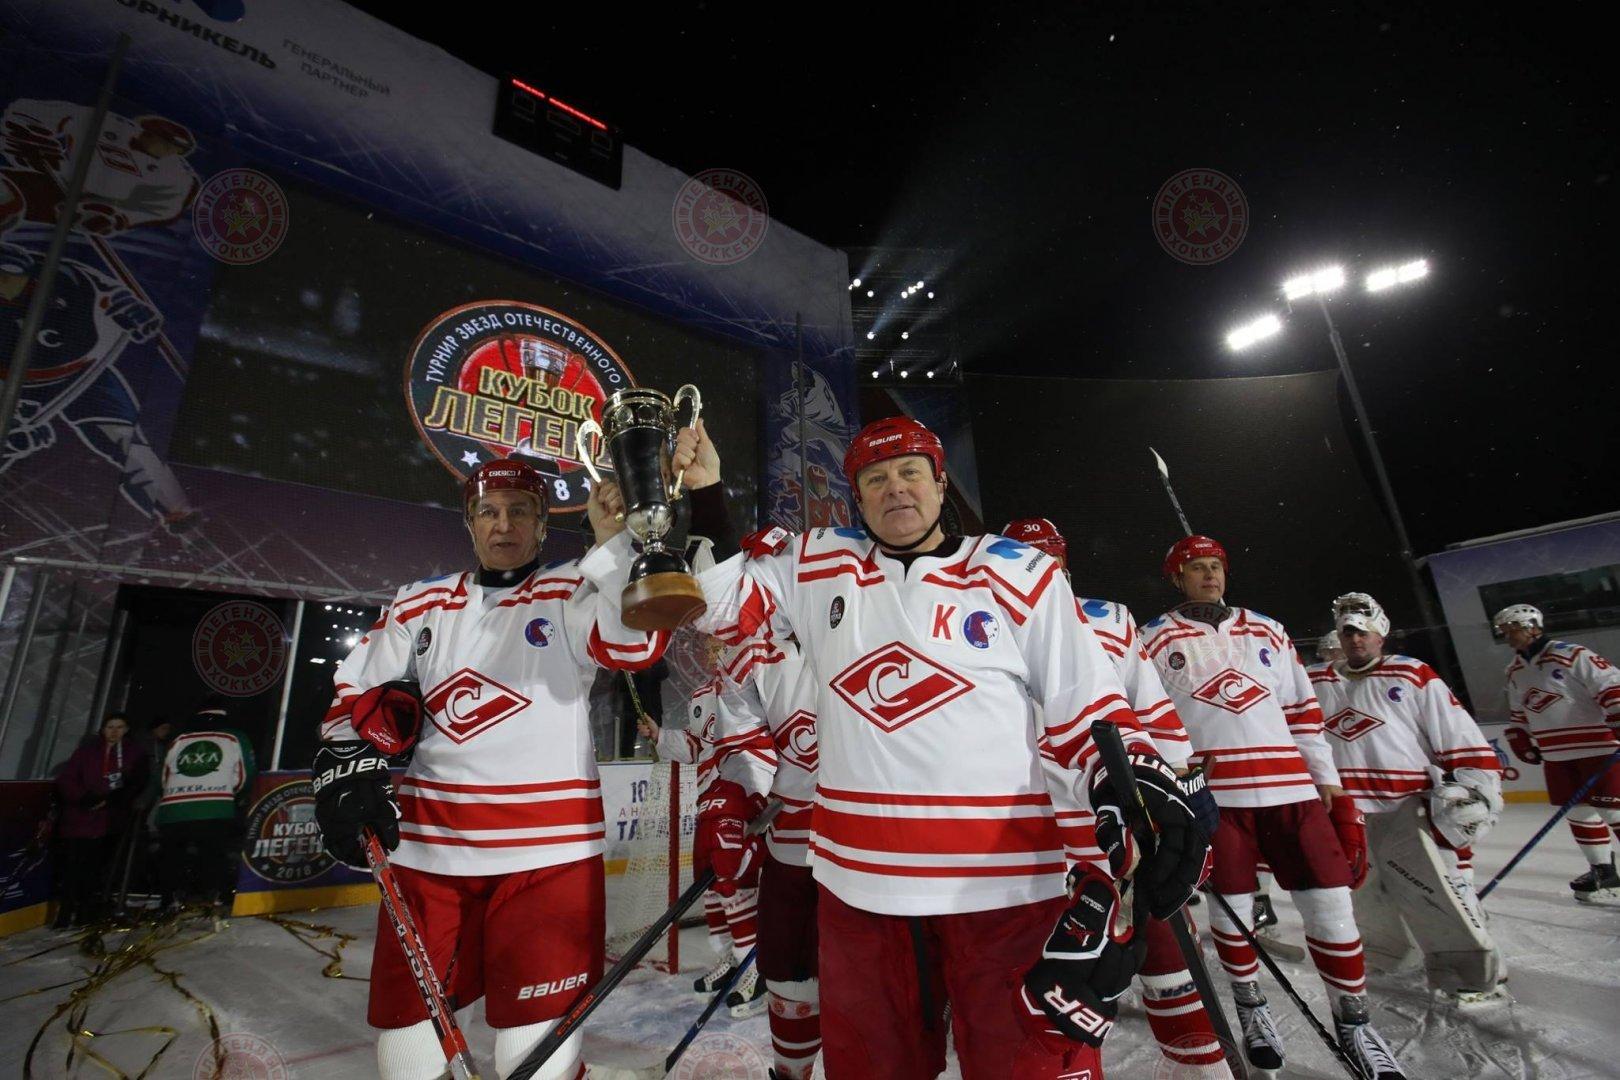 Кубок Легенд впервые у «Спартака»!